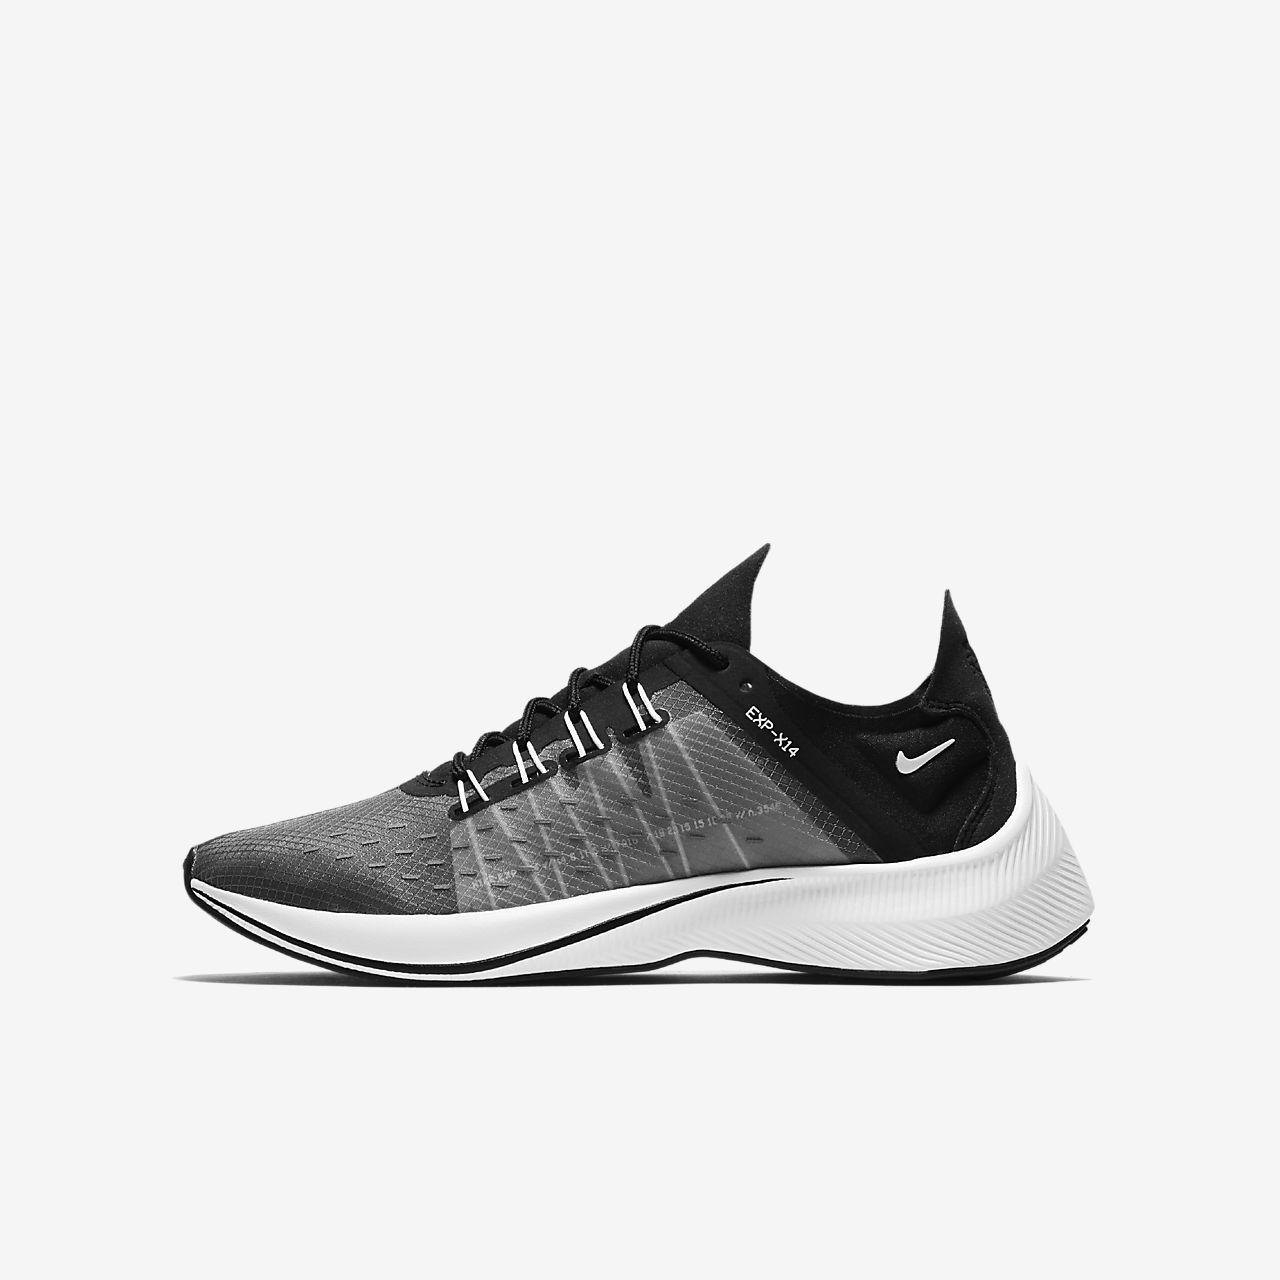 Sko Nike EXP-X14 för ungdom